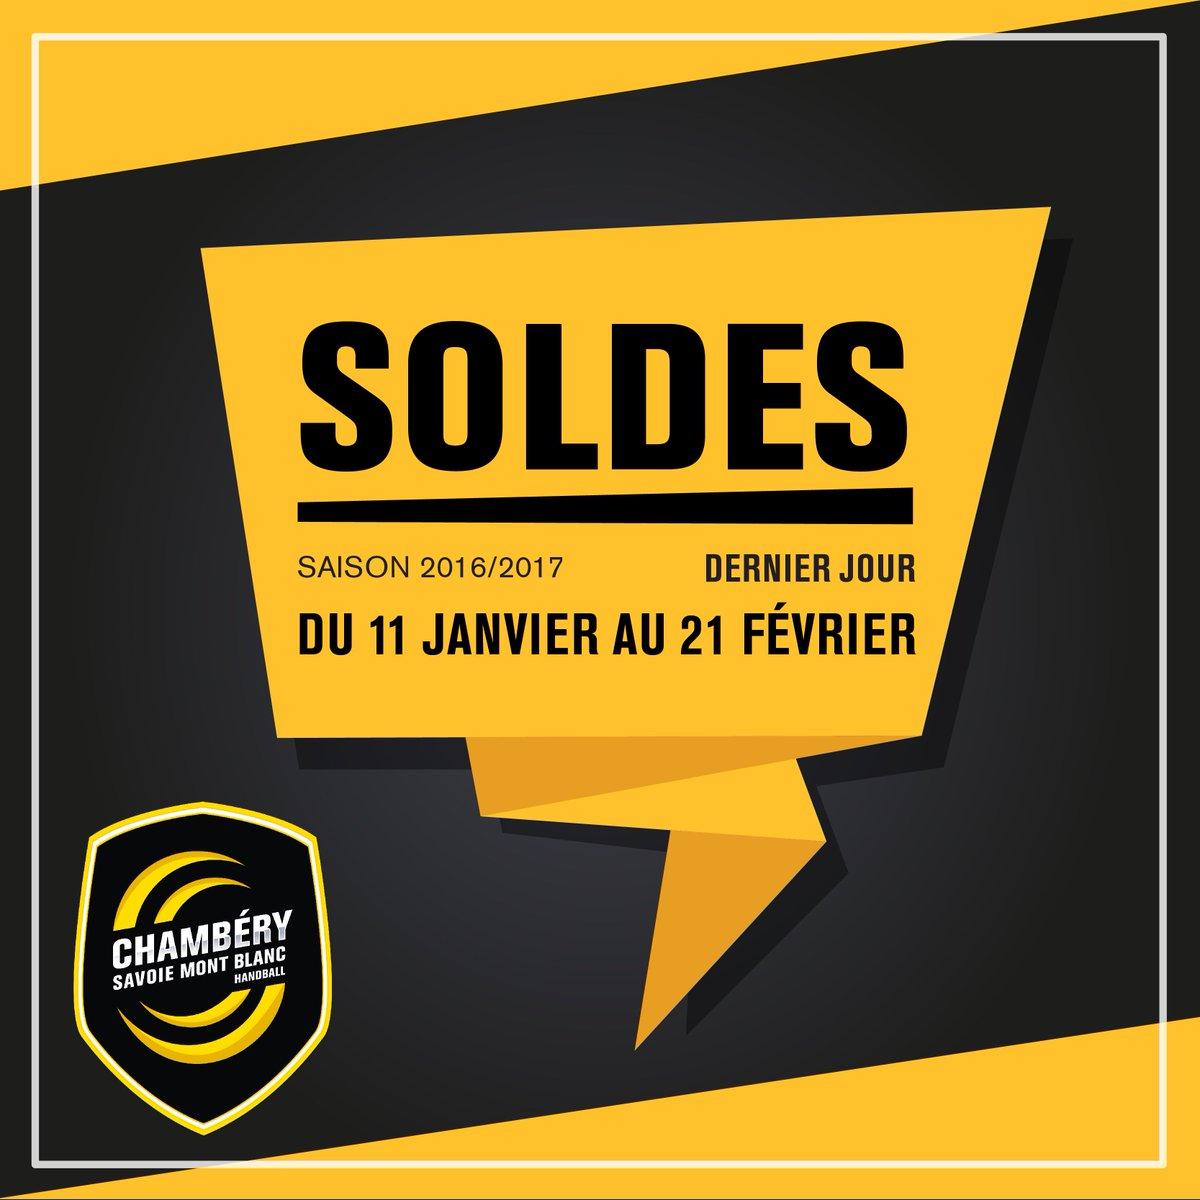 Soldeshiver2017 on - Dernier jour de solde ...